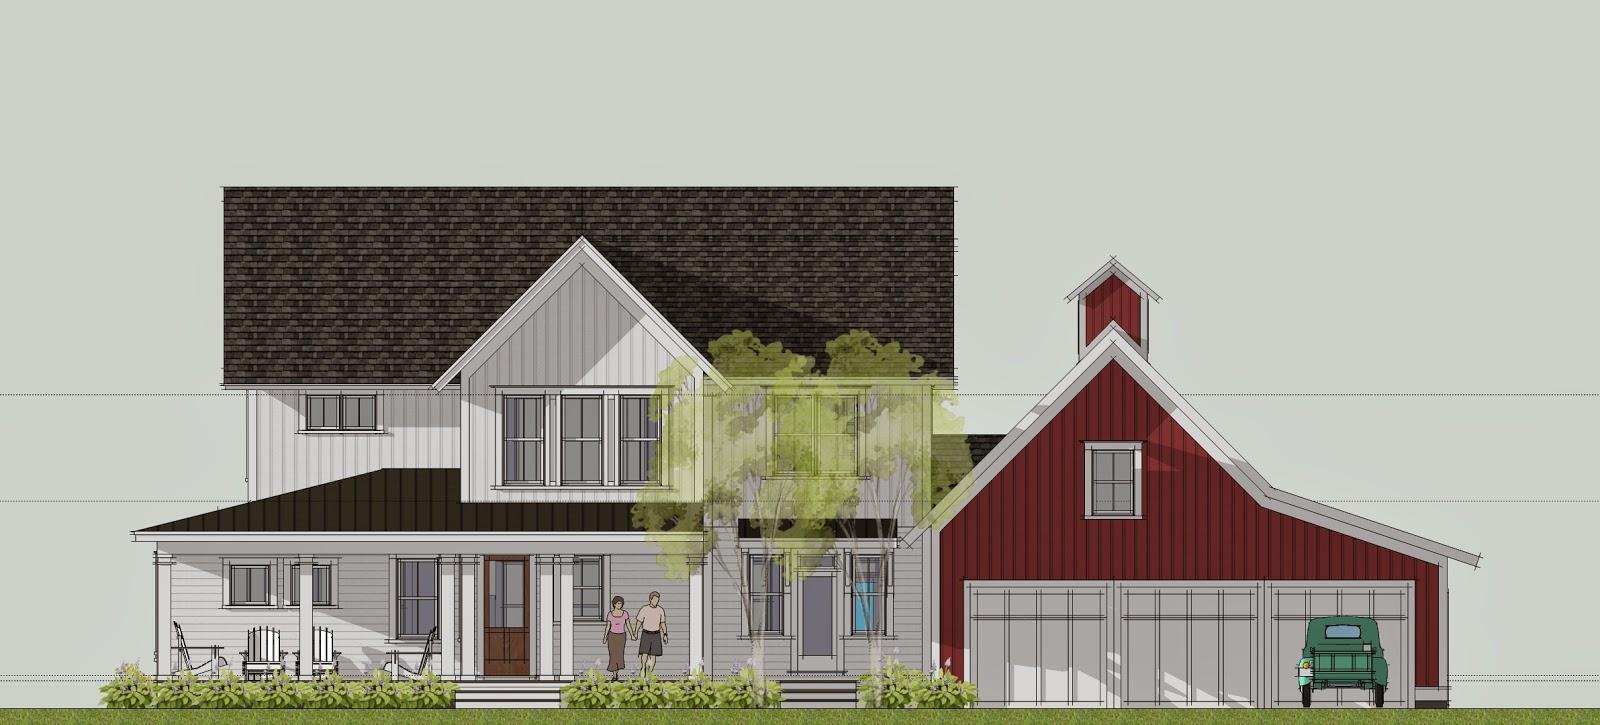 Simply Elegant Home Designs Blog: New Modern Farmhouse by Ron ...